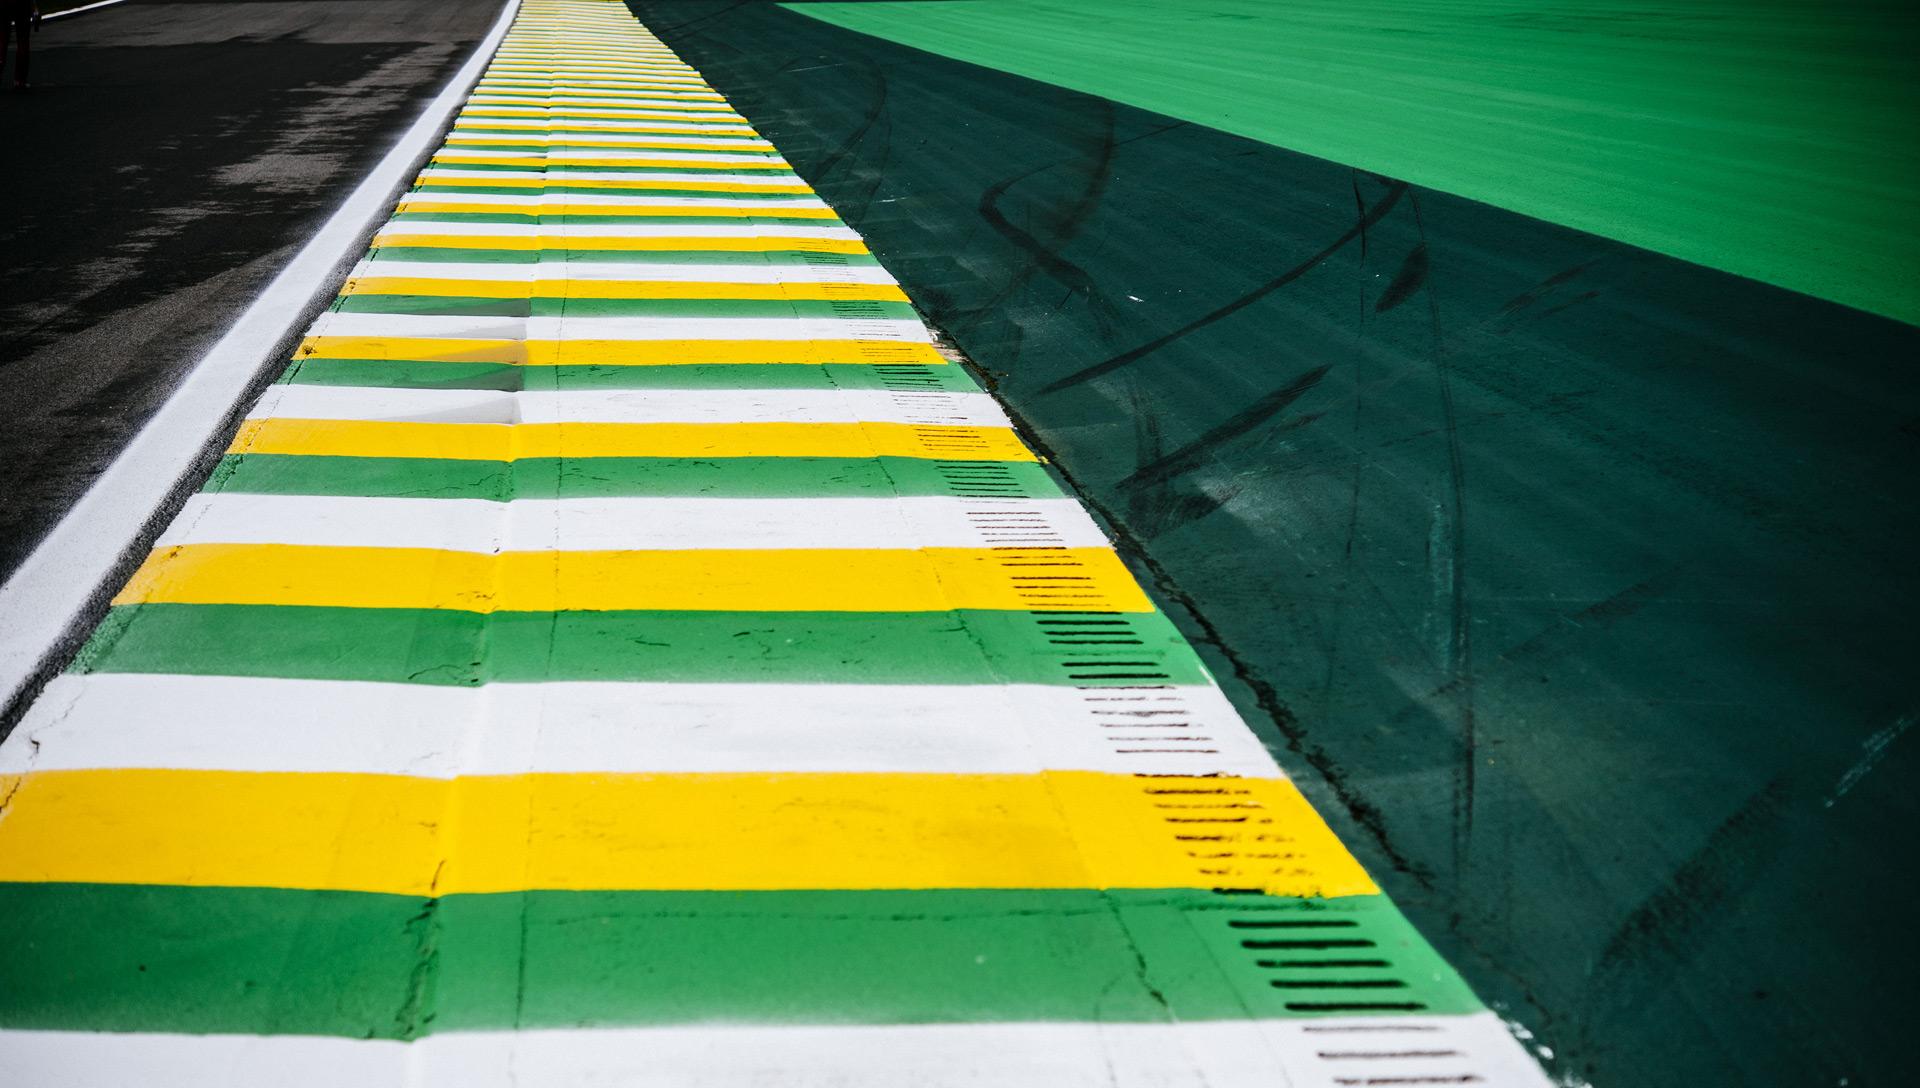 2017 formula 1 brazilian grand prix preview for Carlos house lagos